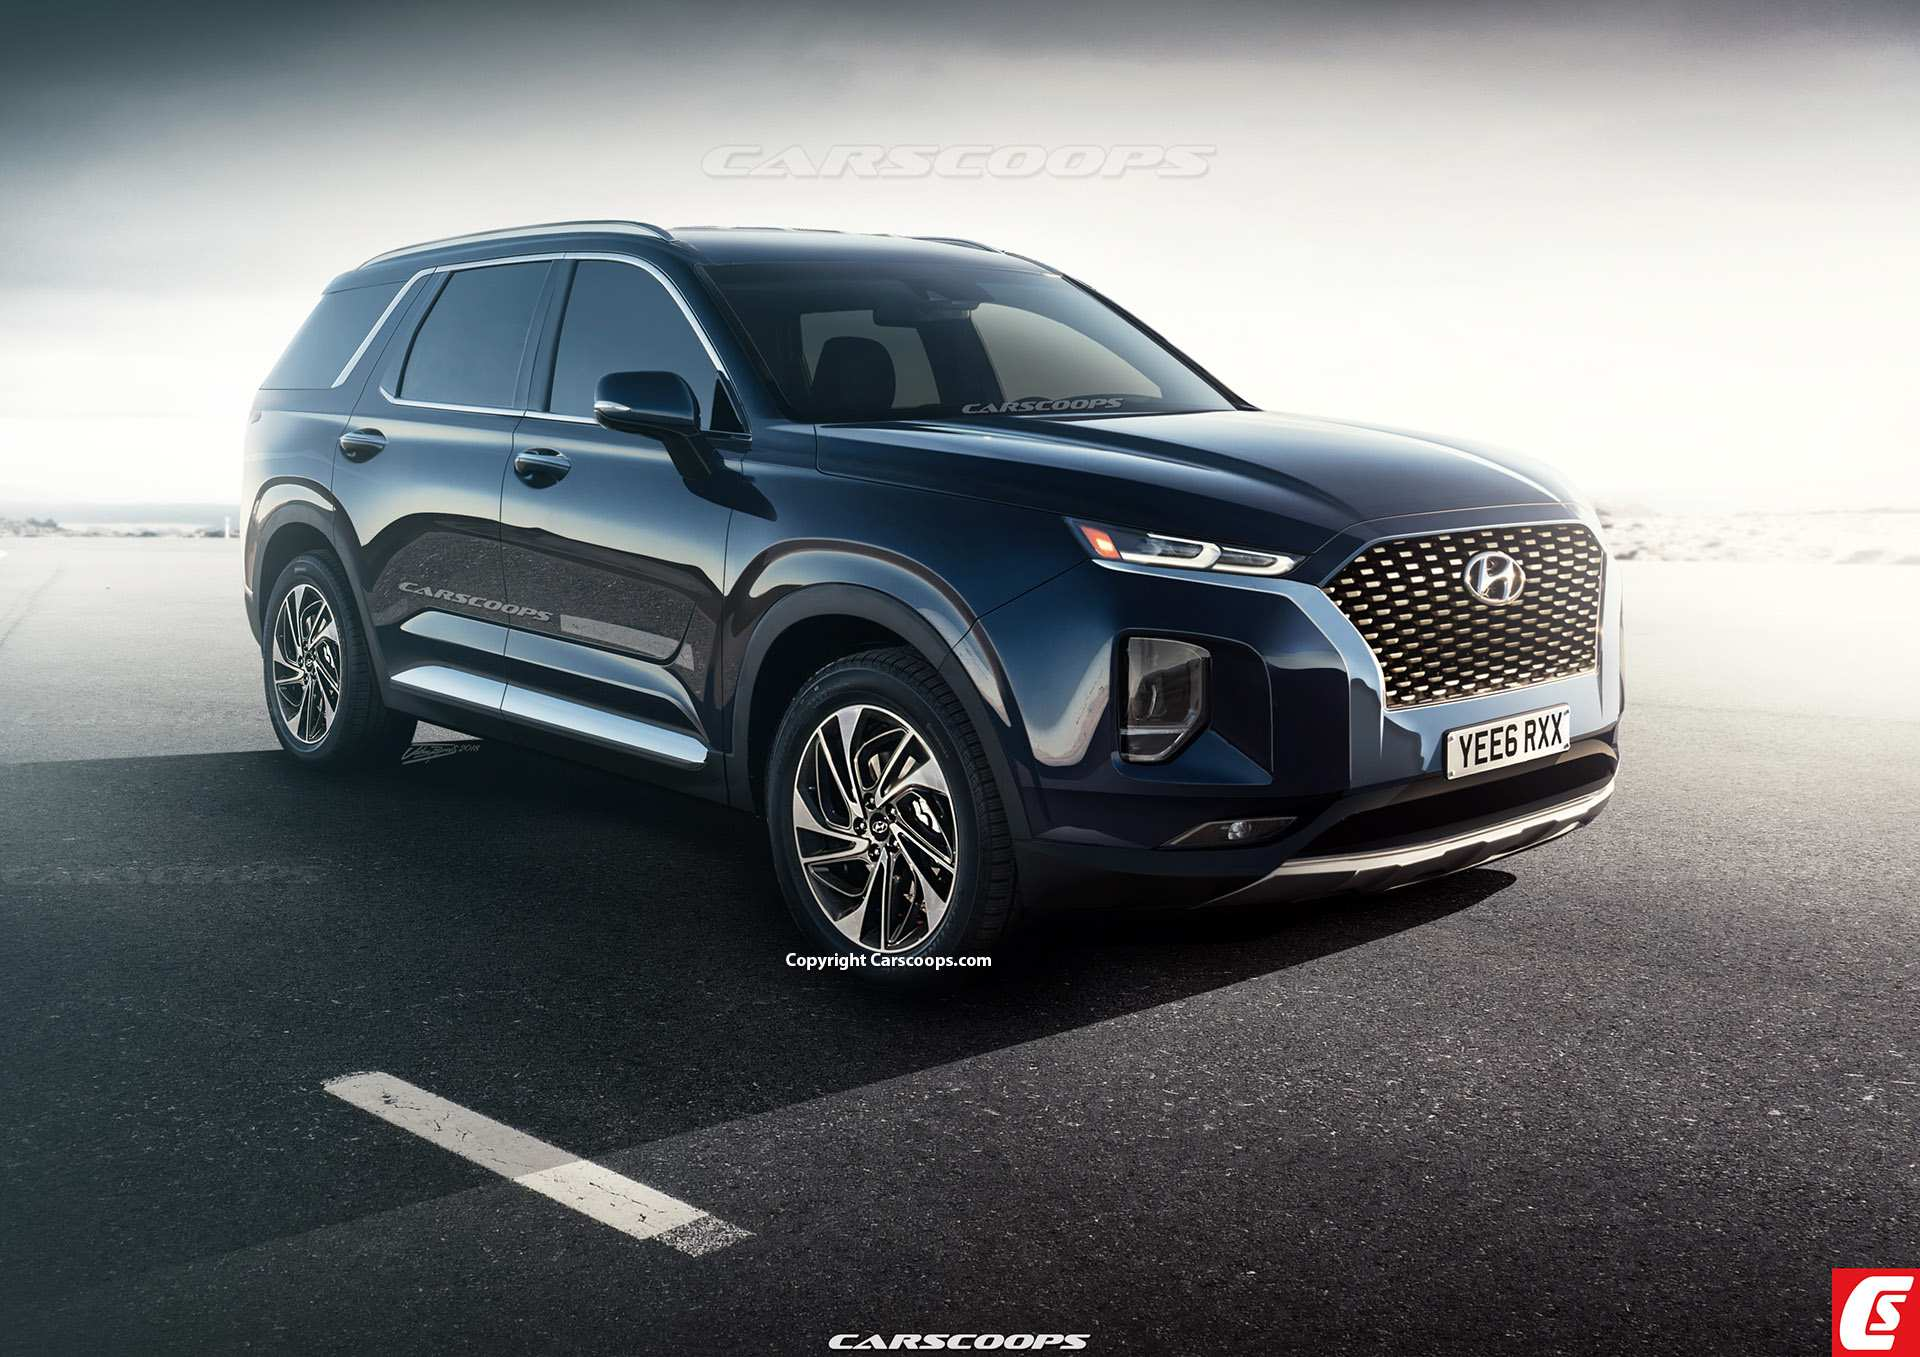 80 New 2020 Hyundai Suv Release Date with 2020 Hyundai Suv